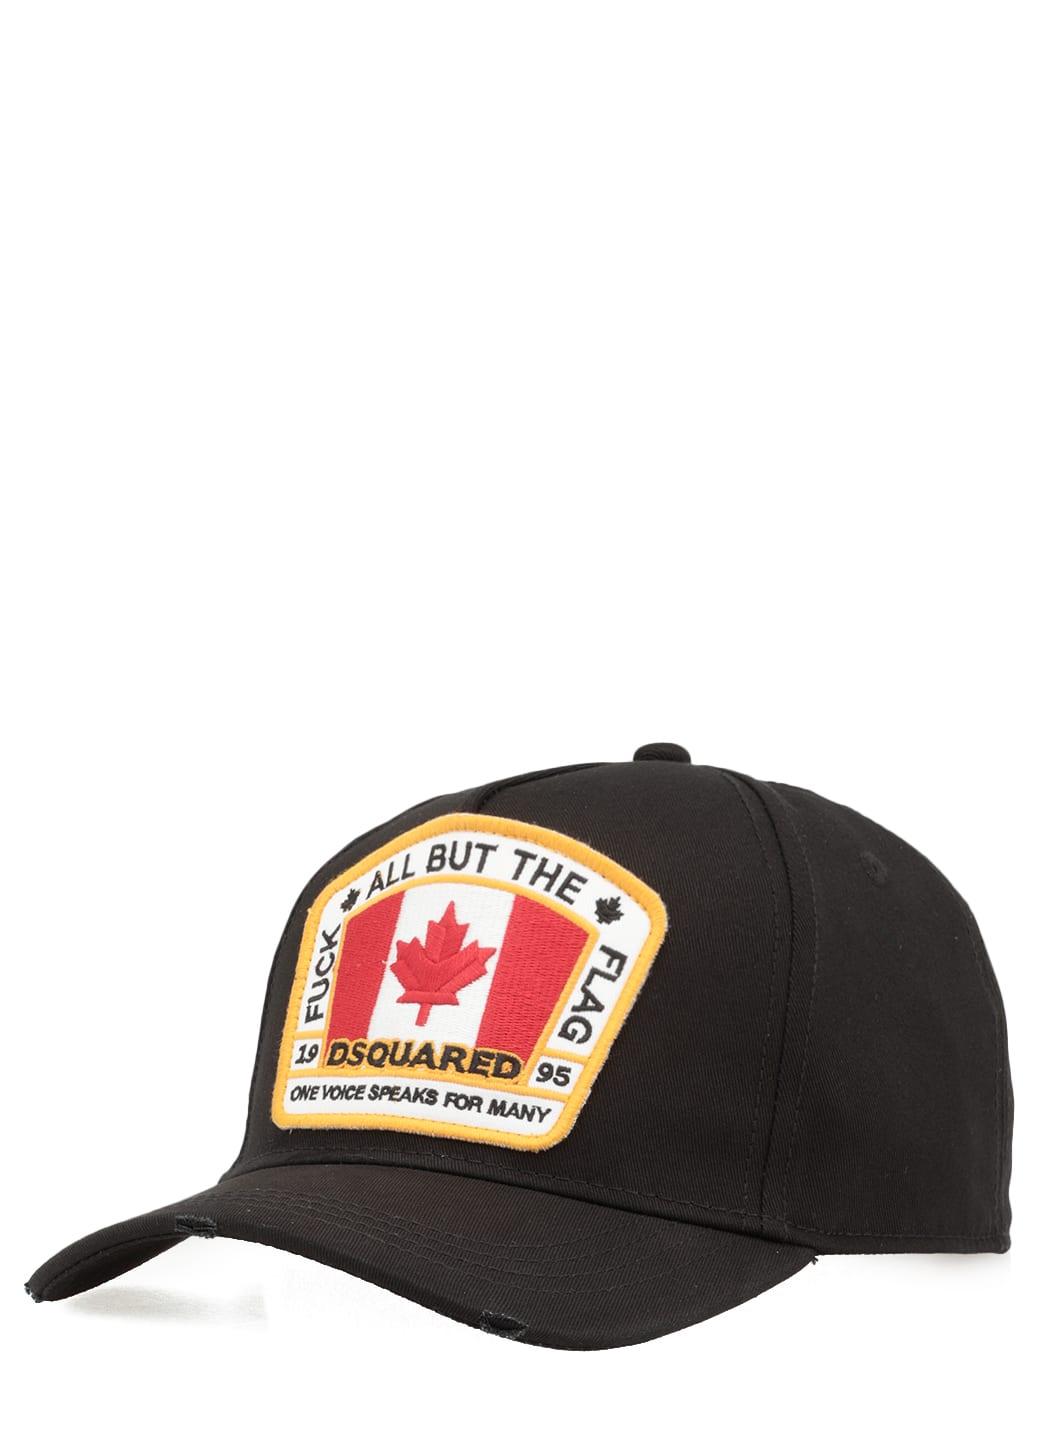 Dsquared2 Caps CANADIAN FLAG BASEBALL CAP